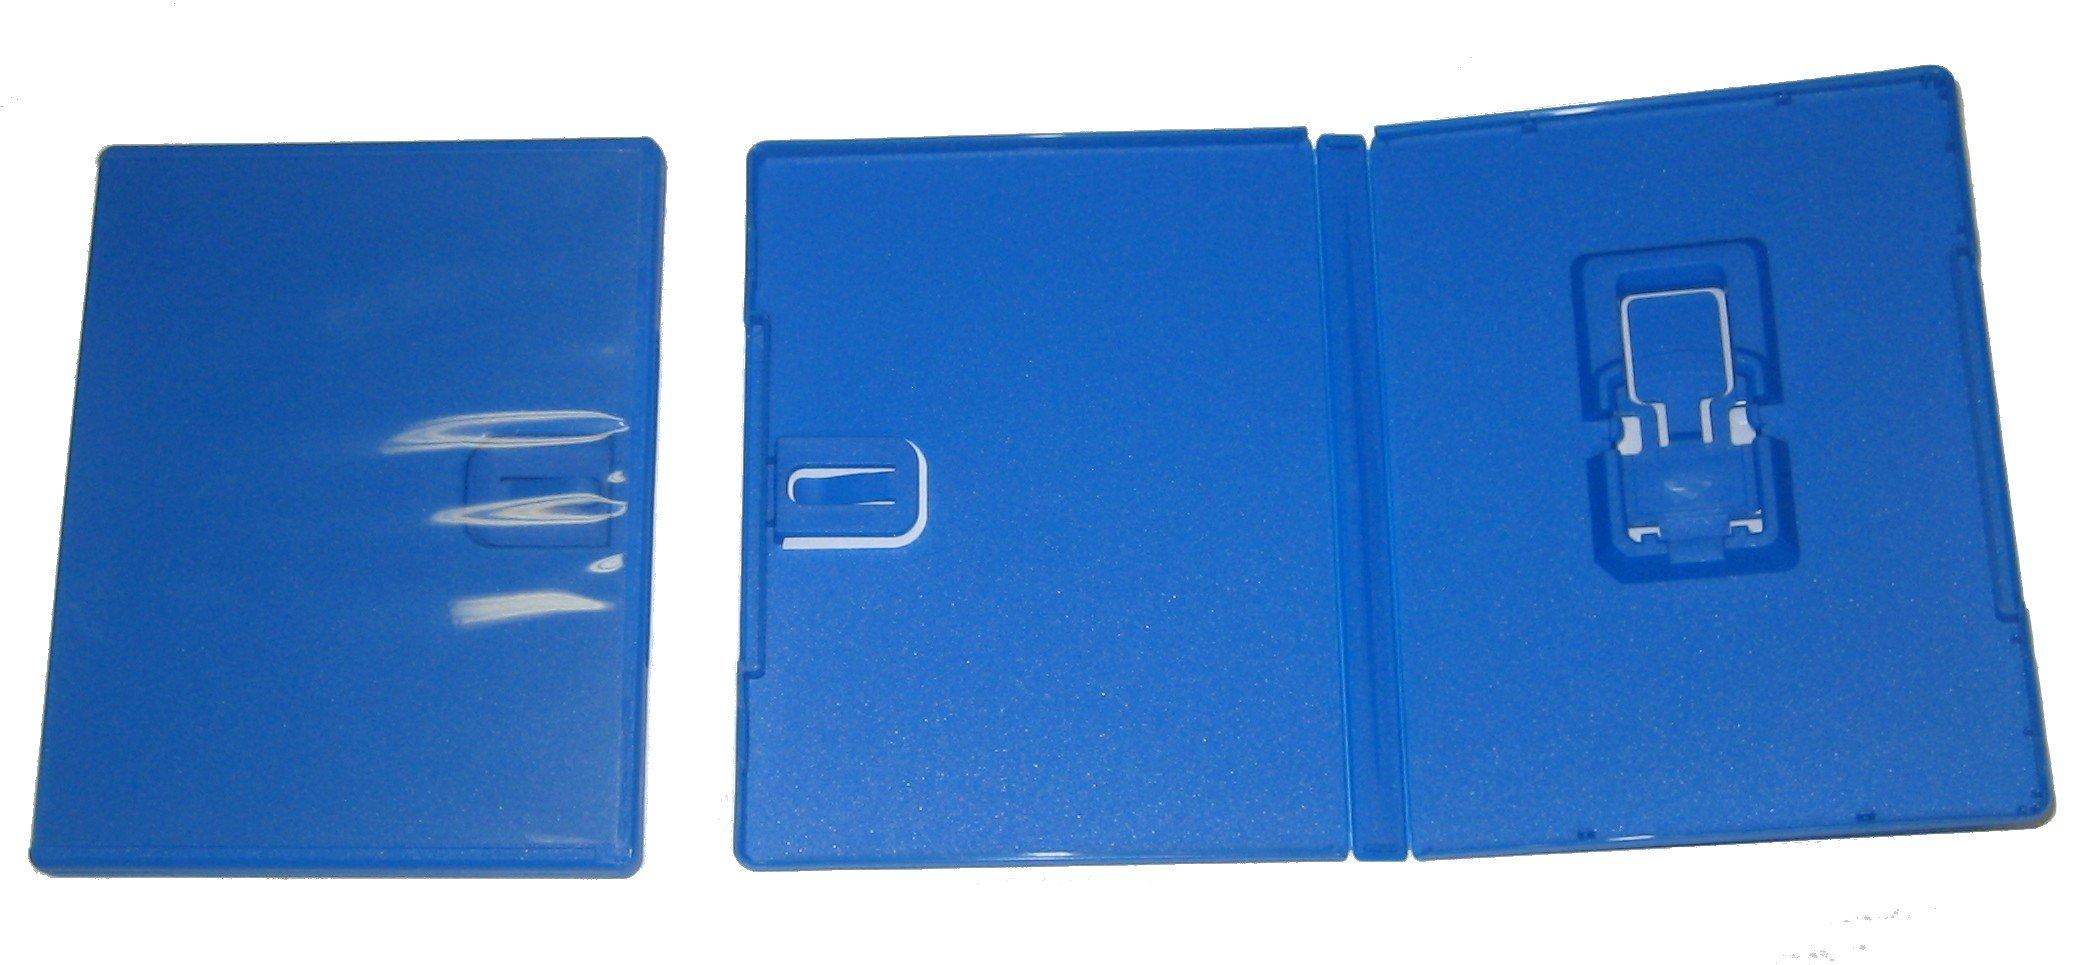 PlayStation Vita memory storage case PLAYSTATION VITA MEMORY STORAGE CASE, PSVITA, 200 UNITS/BOX by LDB